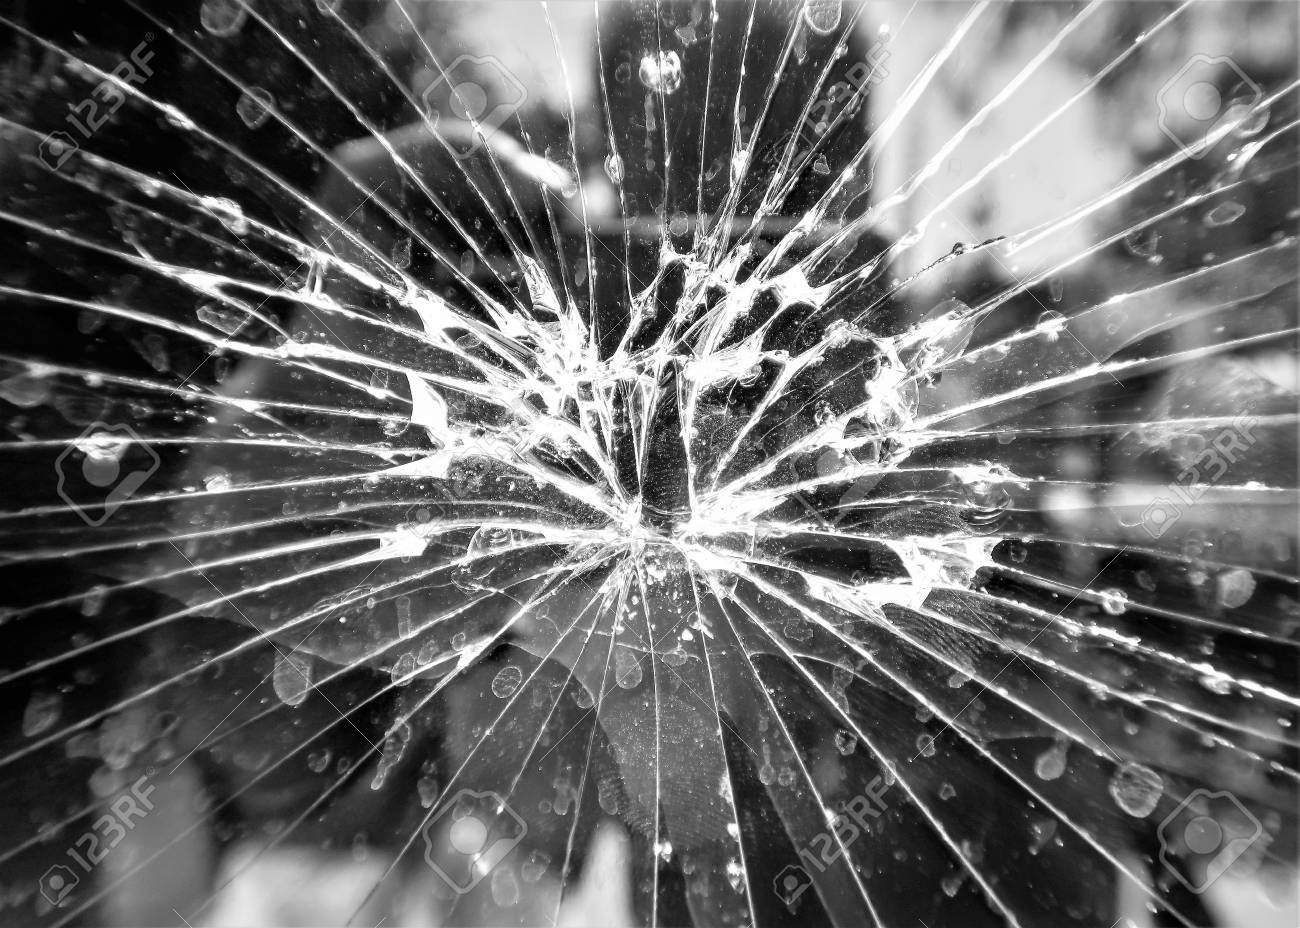 REALITY PROGRAMI: Ogledalo koje bismo rado razbili